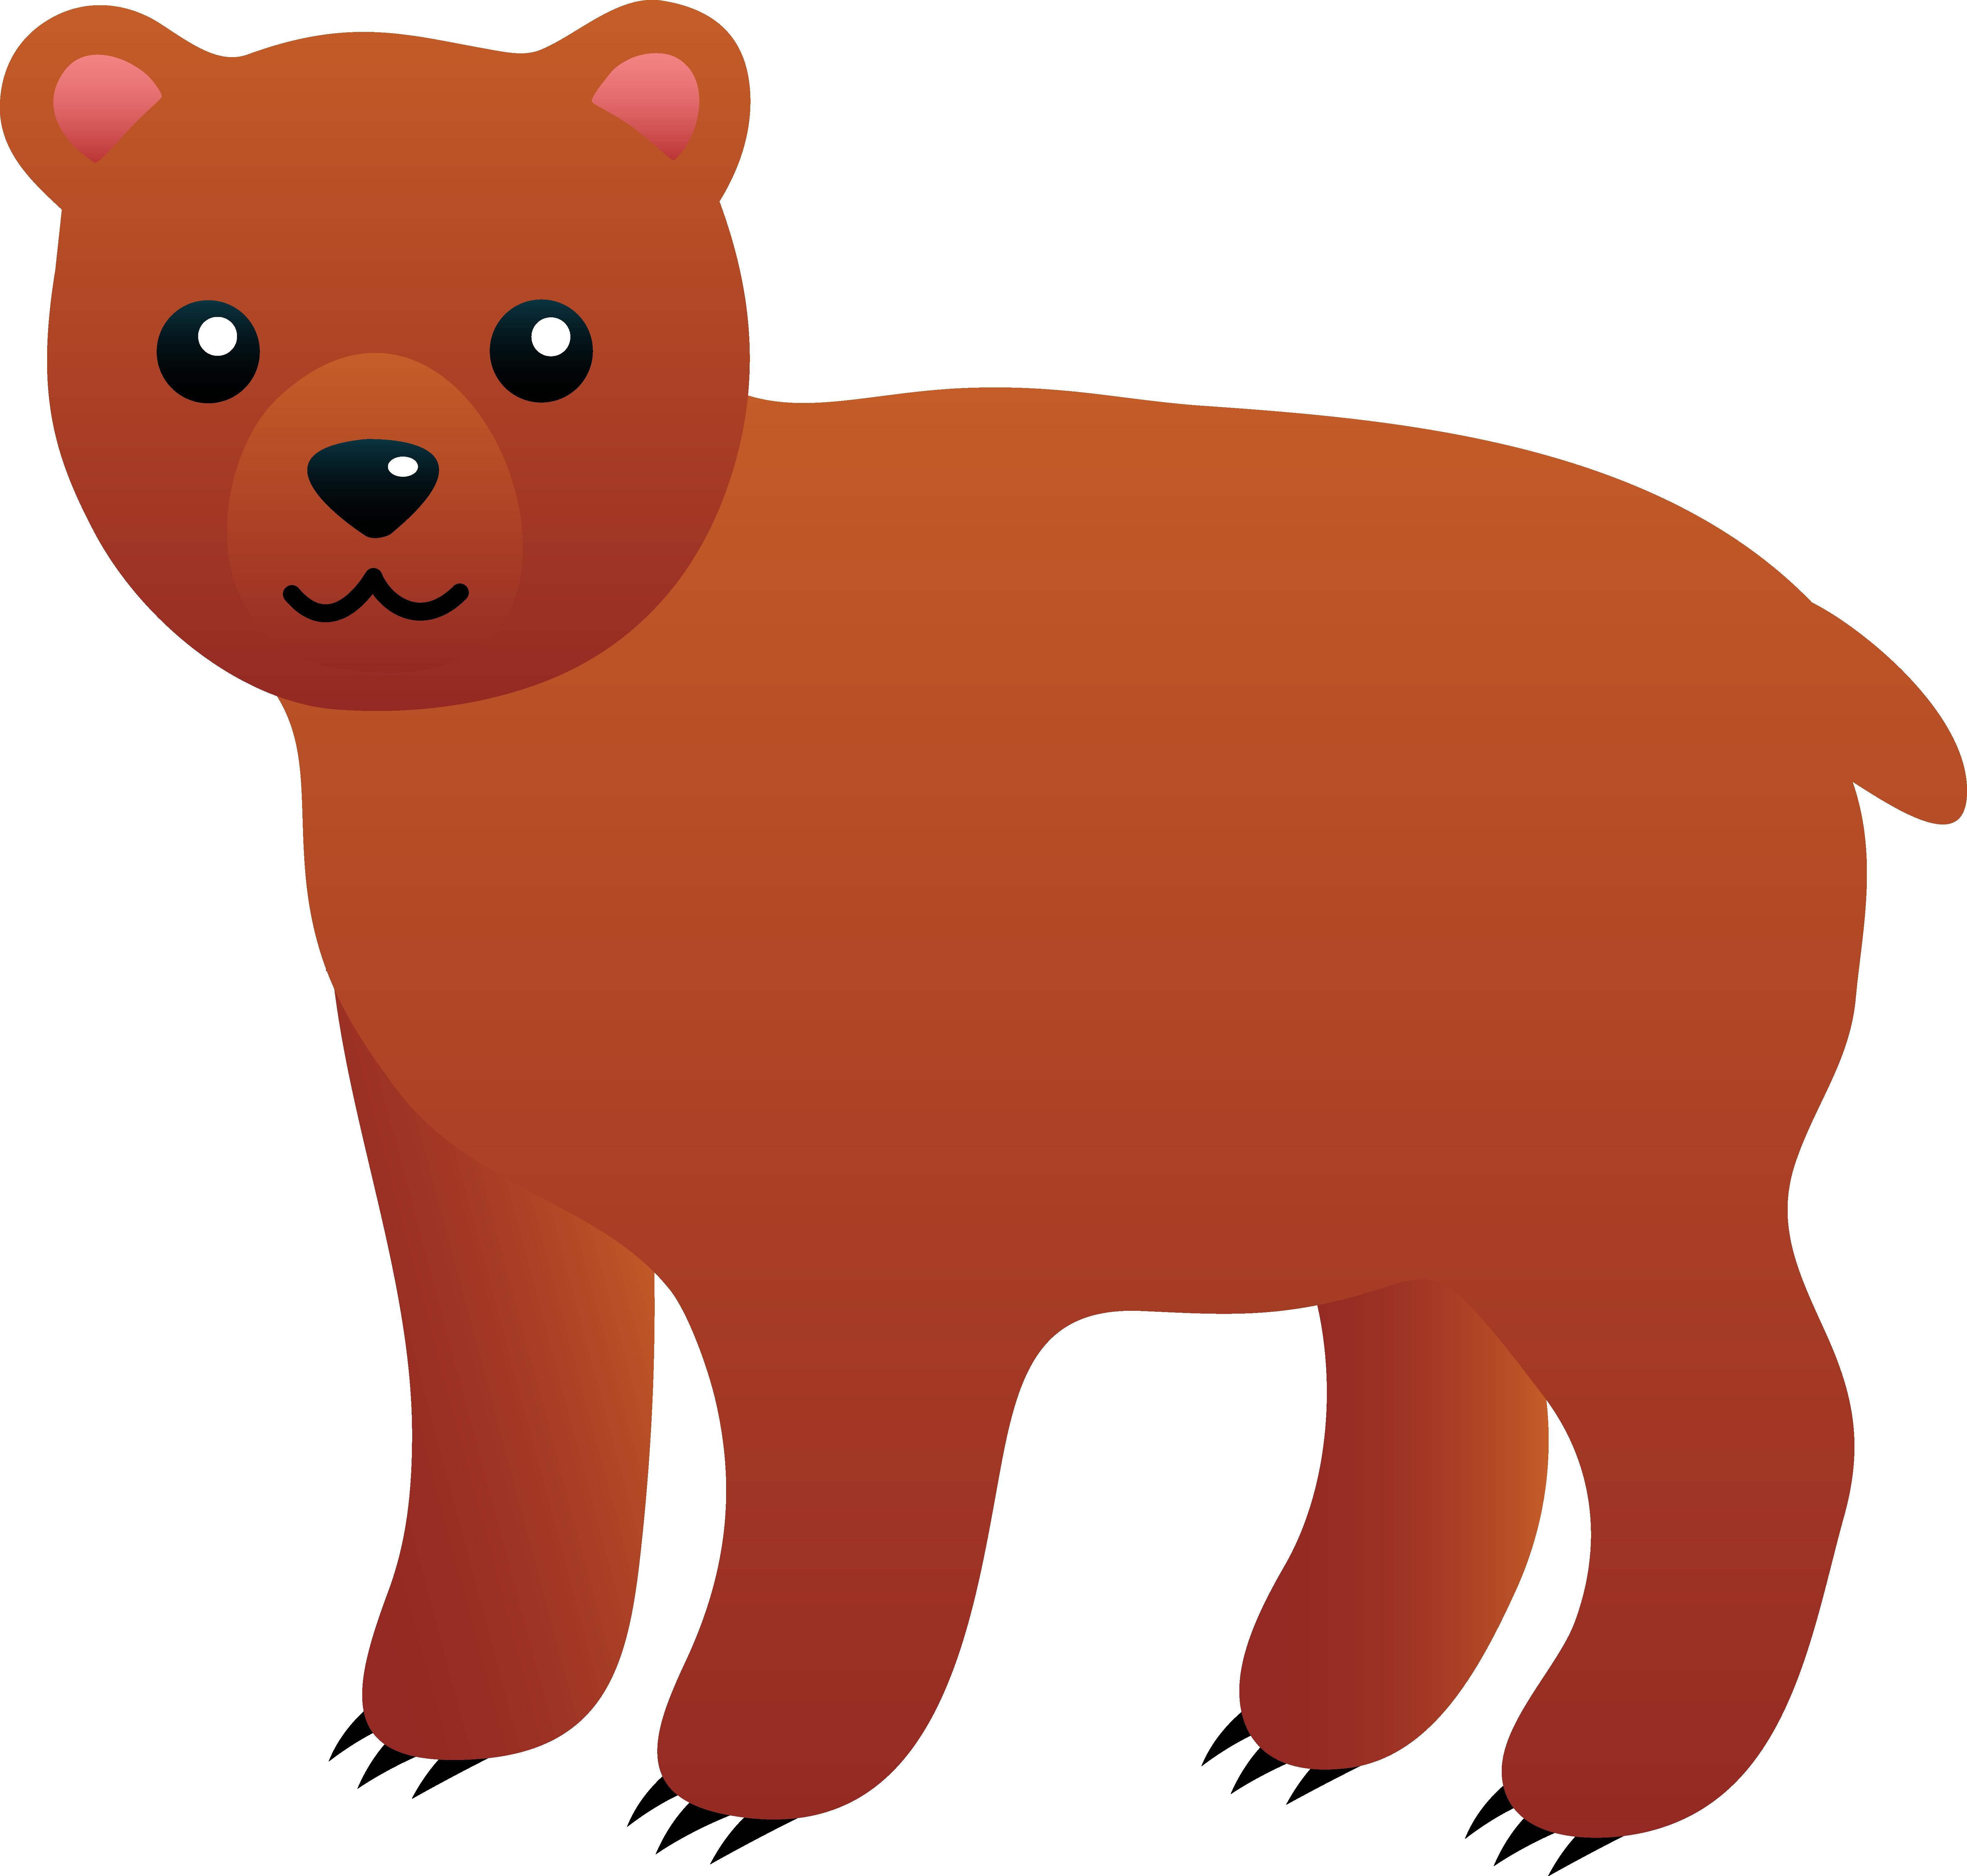 Bear Cub clipart #2, Download drawings